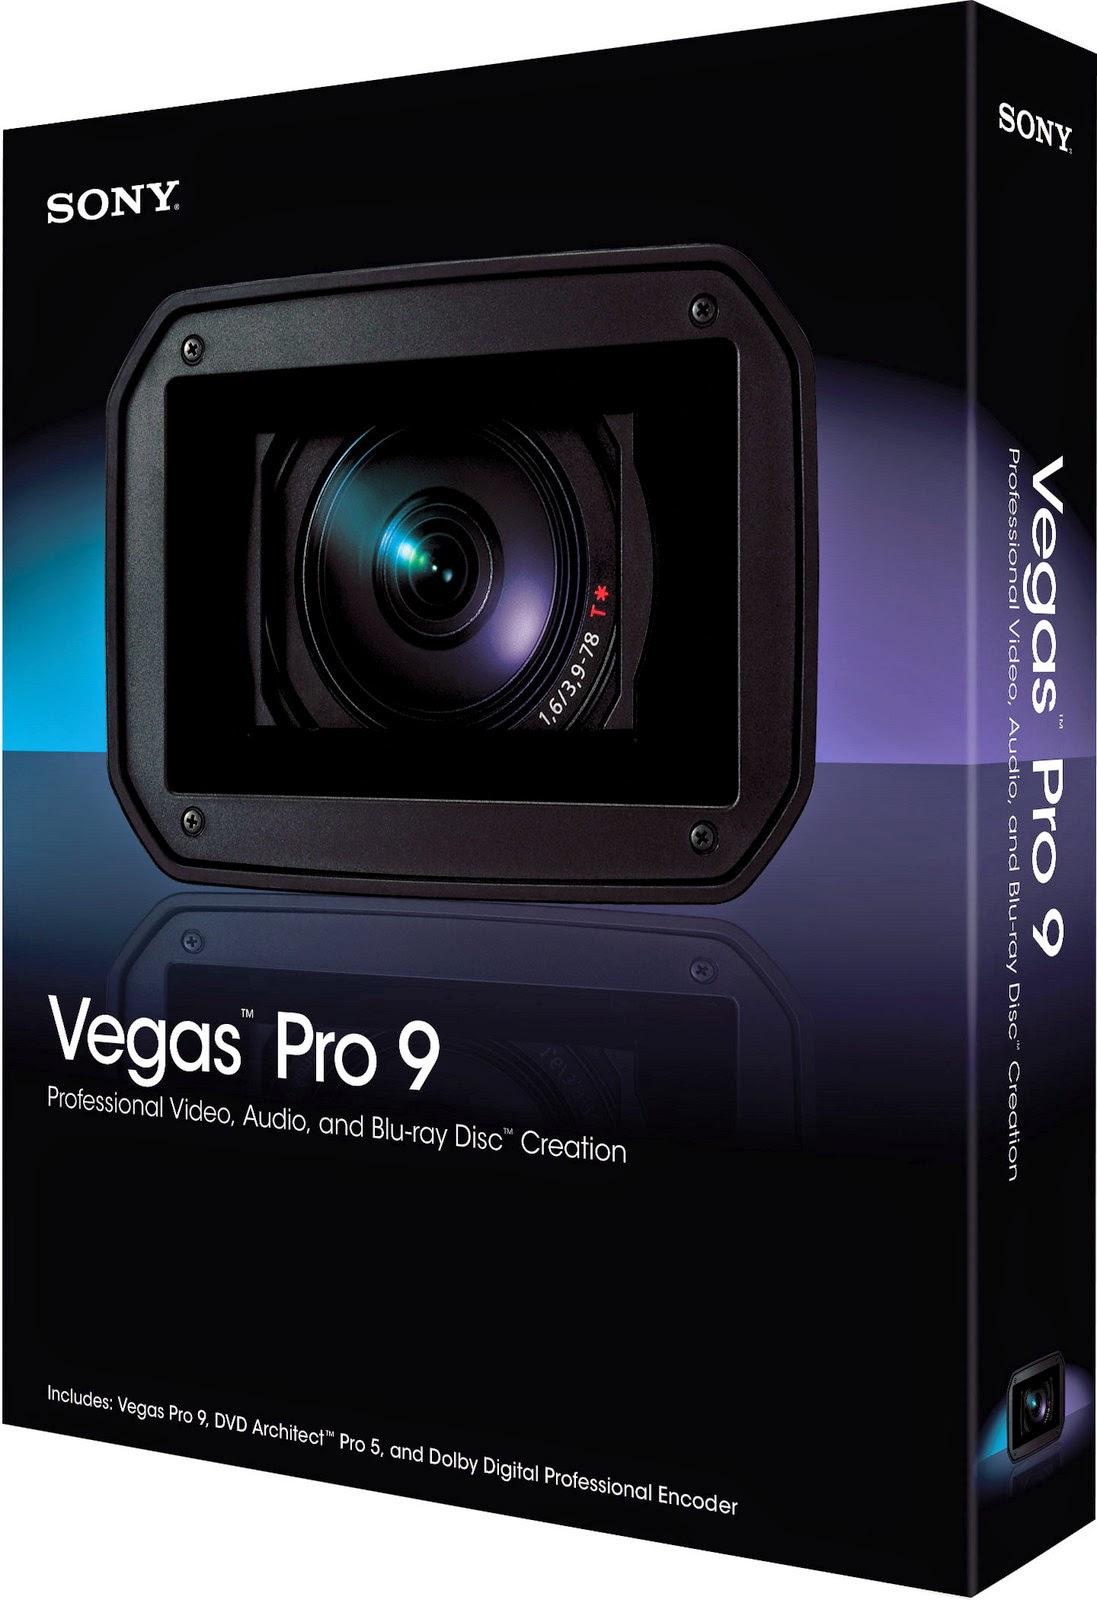 Sony VEGAS PRO 9 - Software audio professionale. Нажмите на эту ссылку, чт